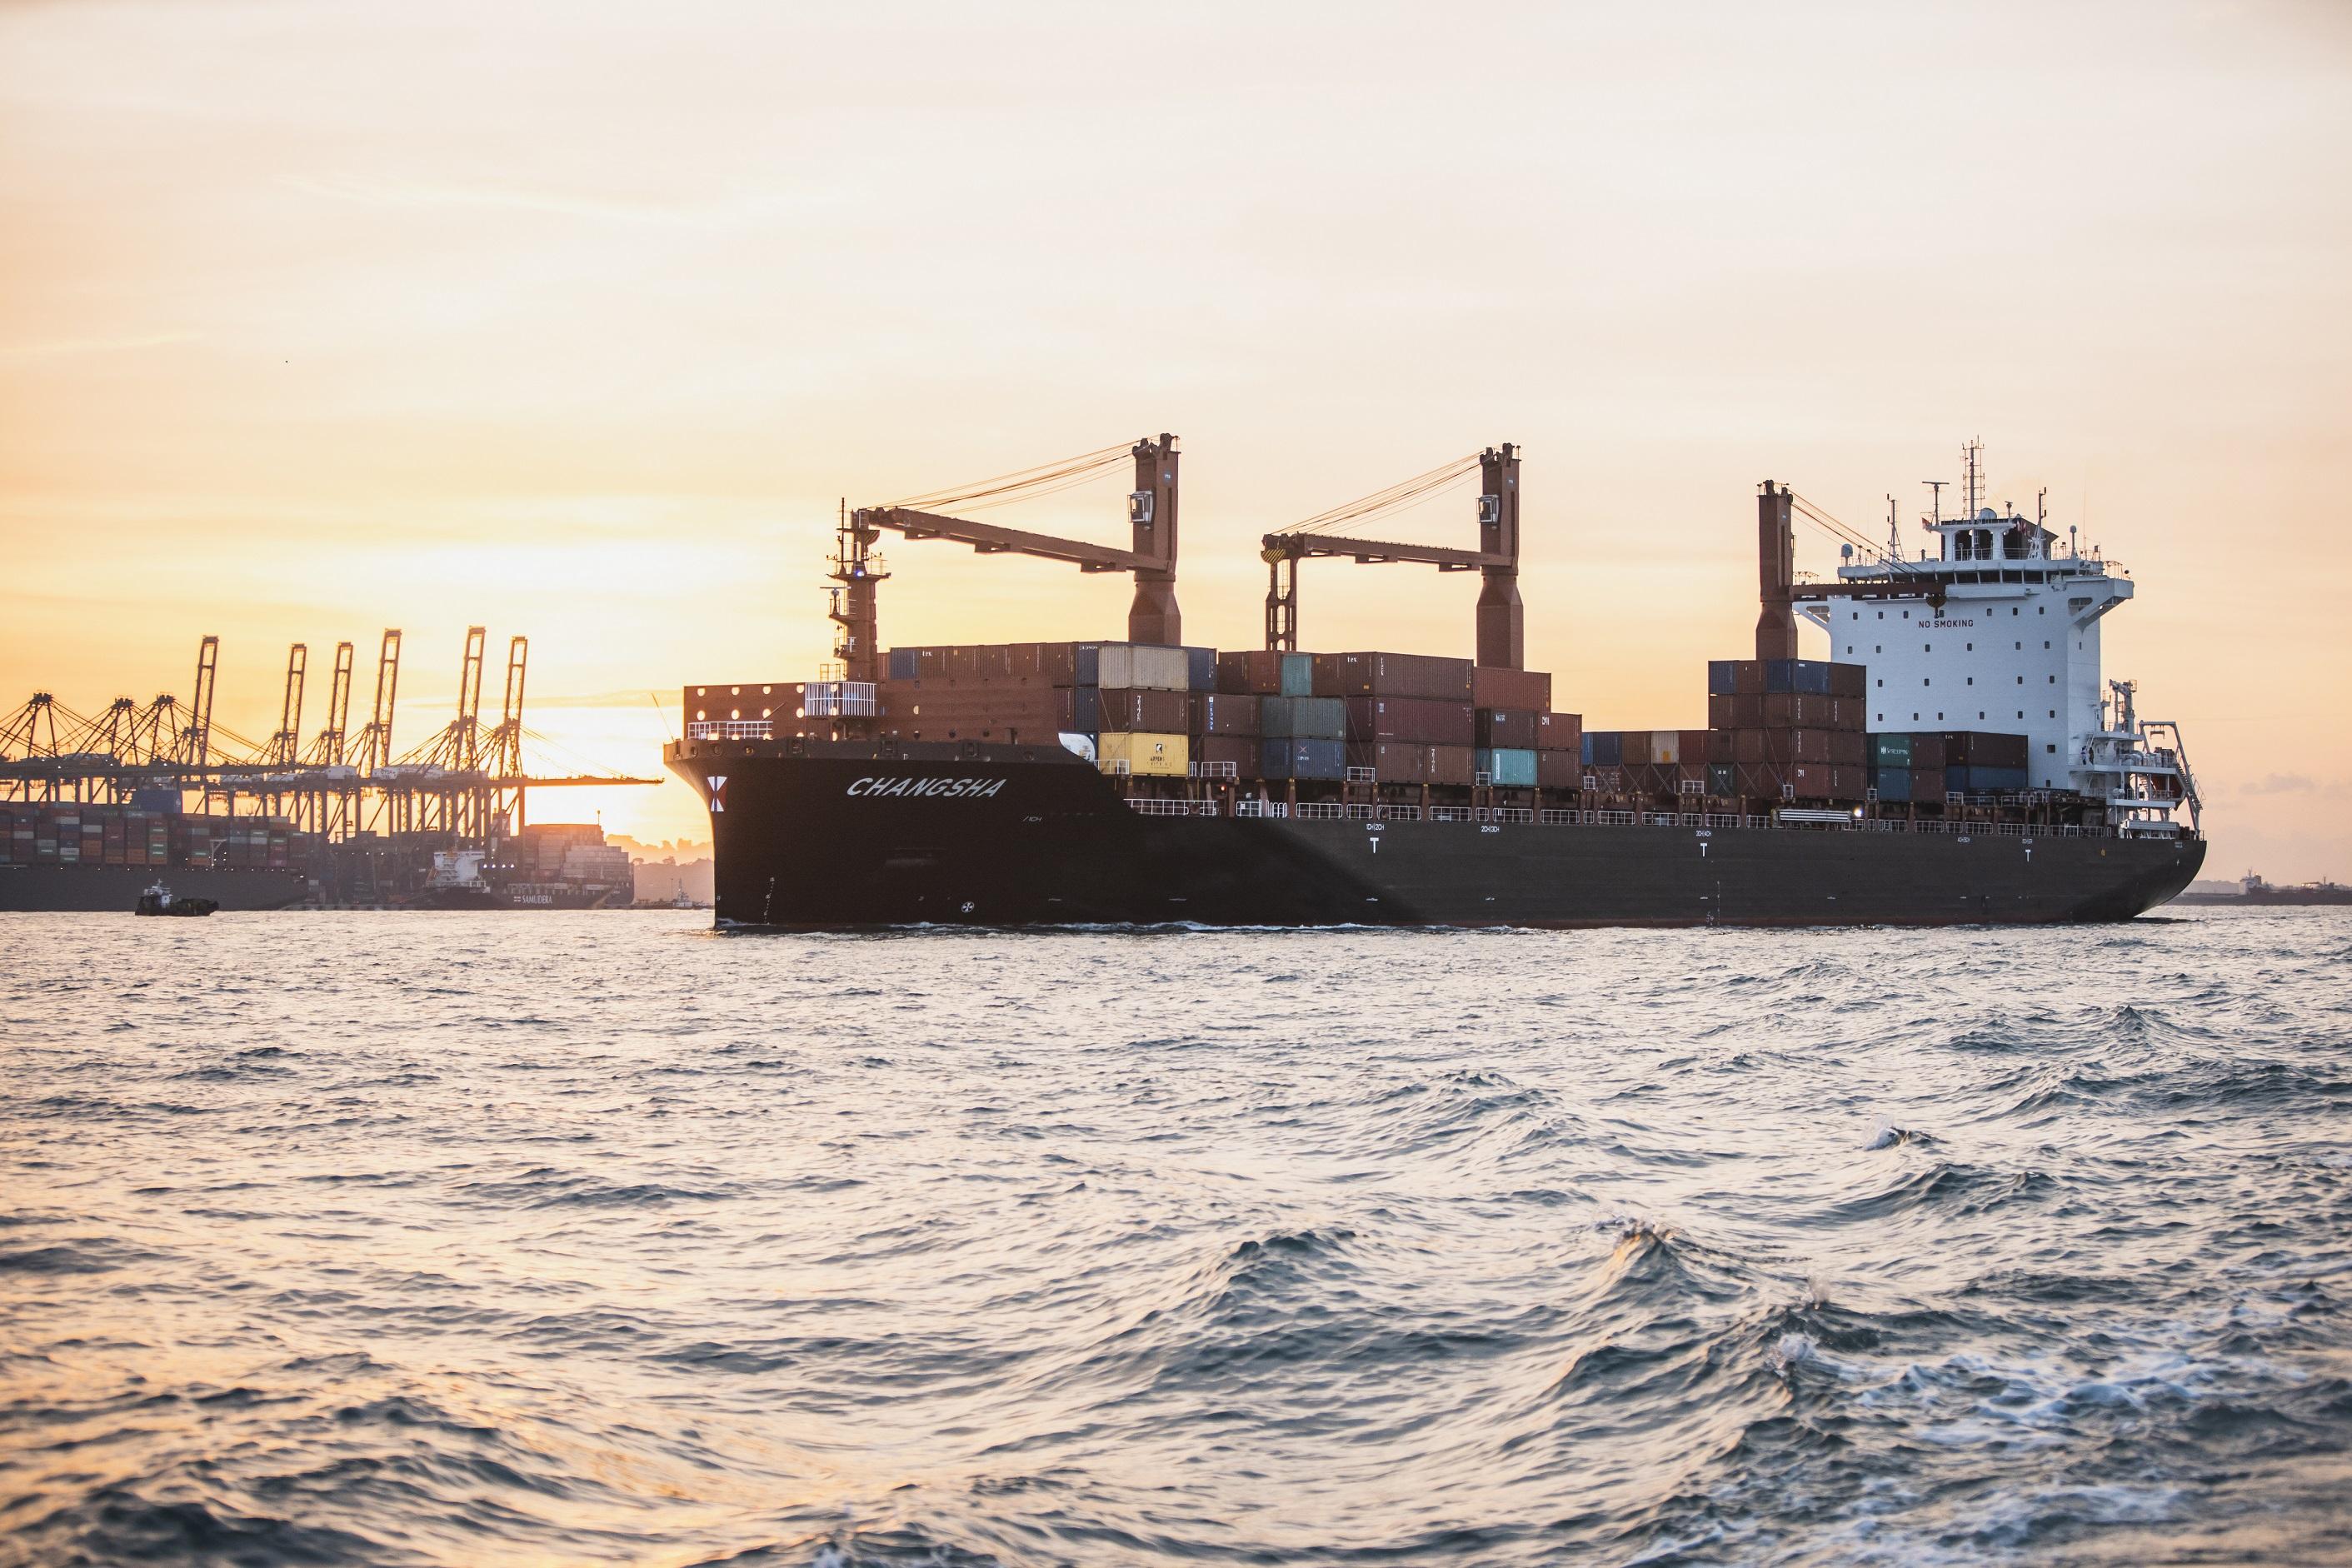 The China Navigation Company chooses Dualog Drive to streamline ship to shore digital systems